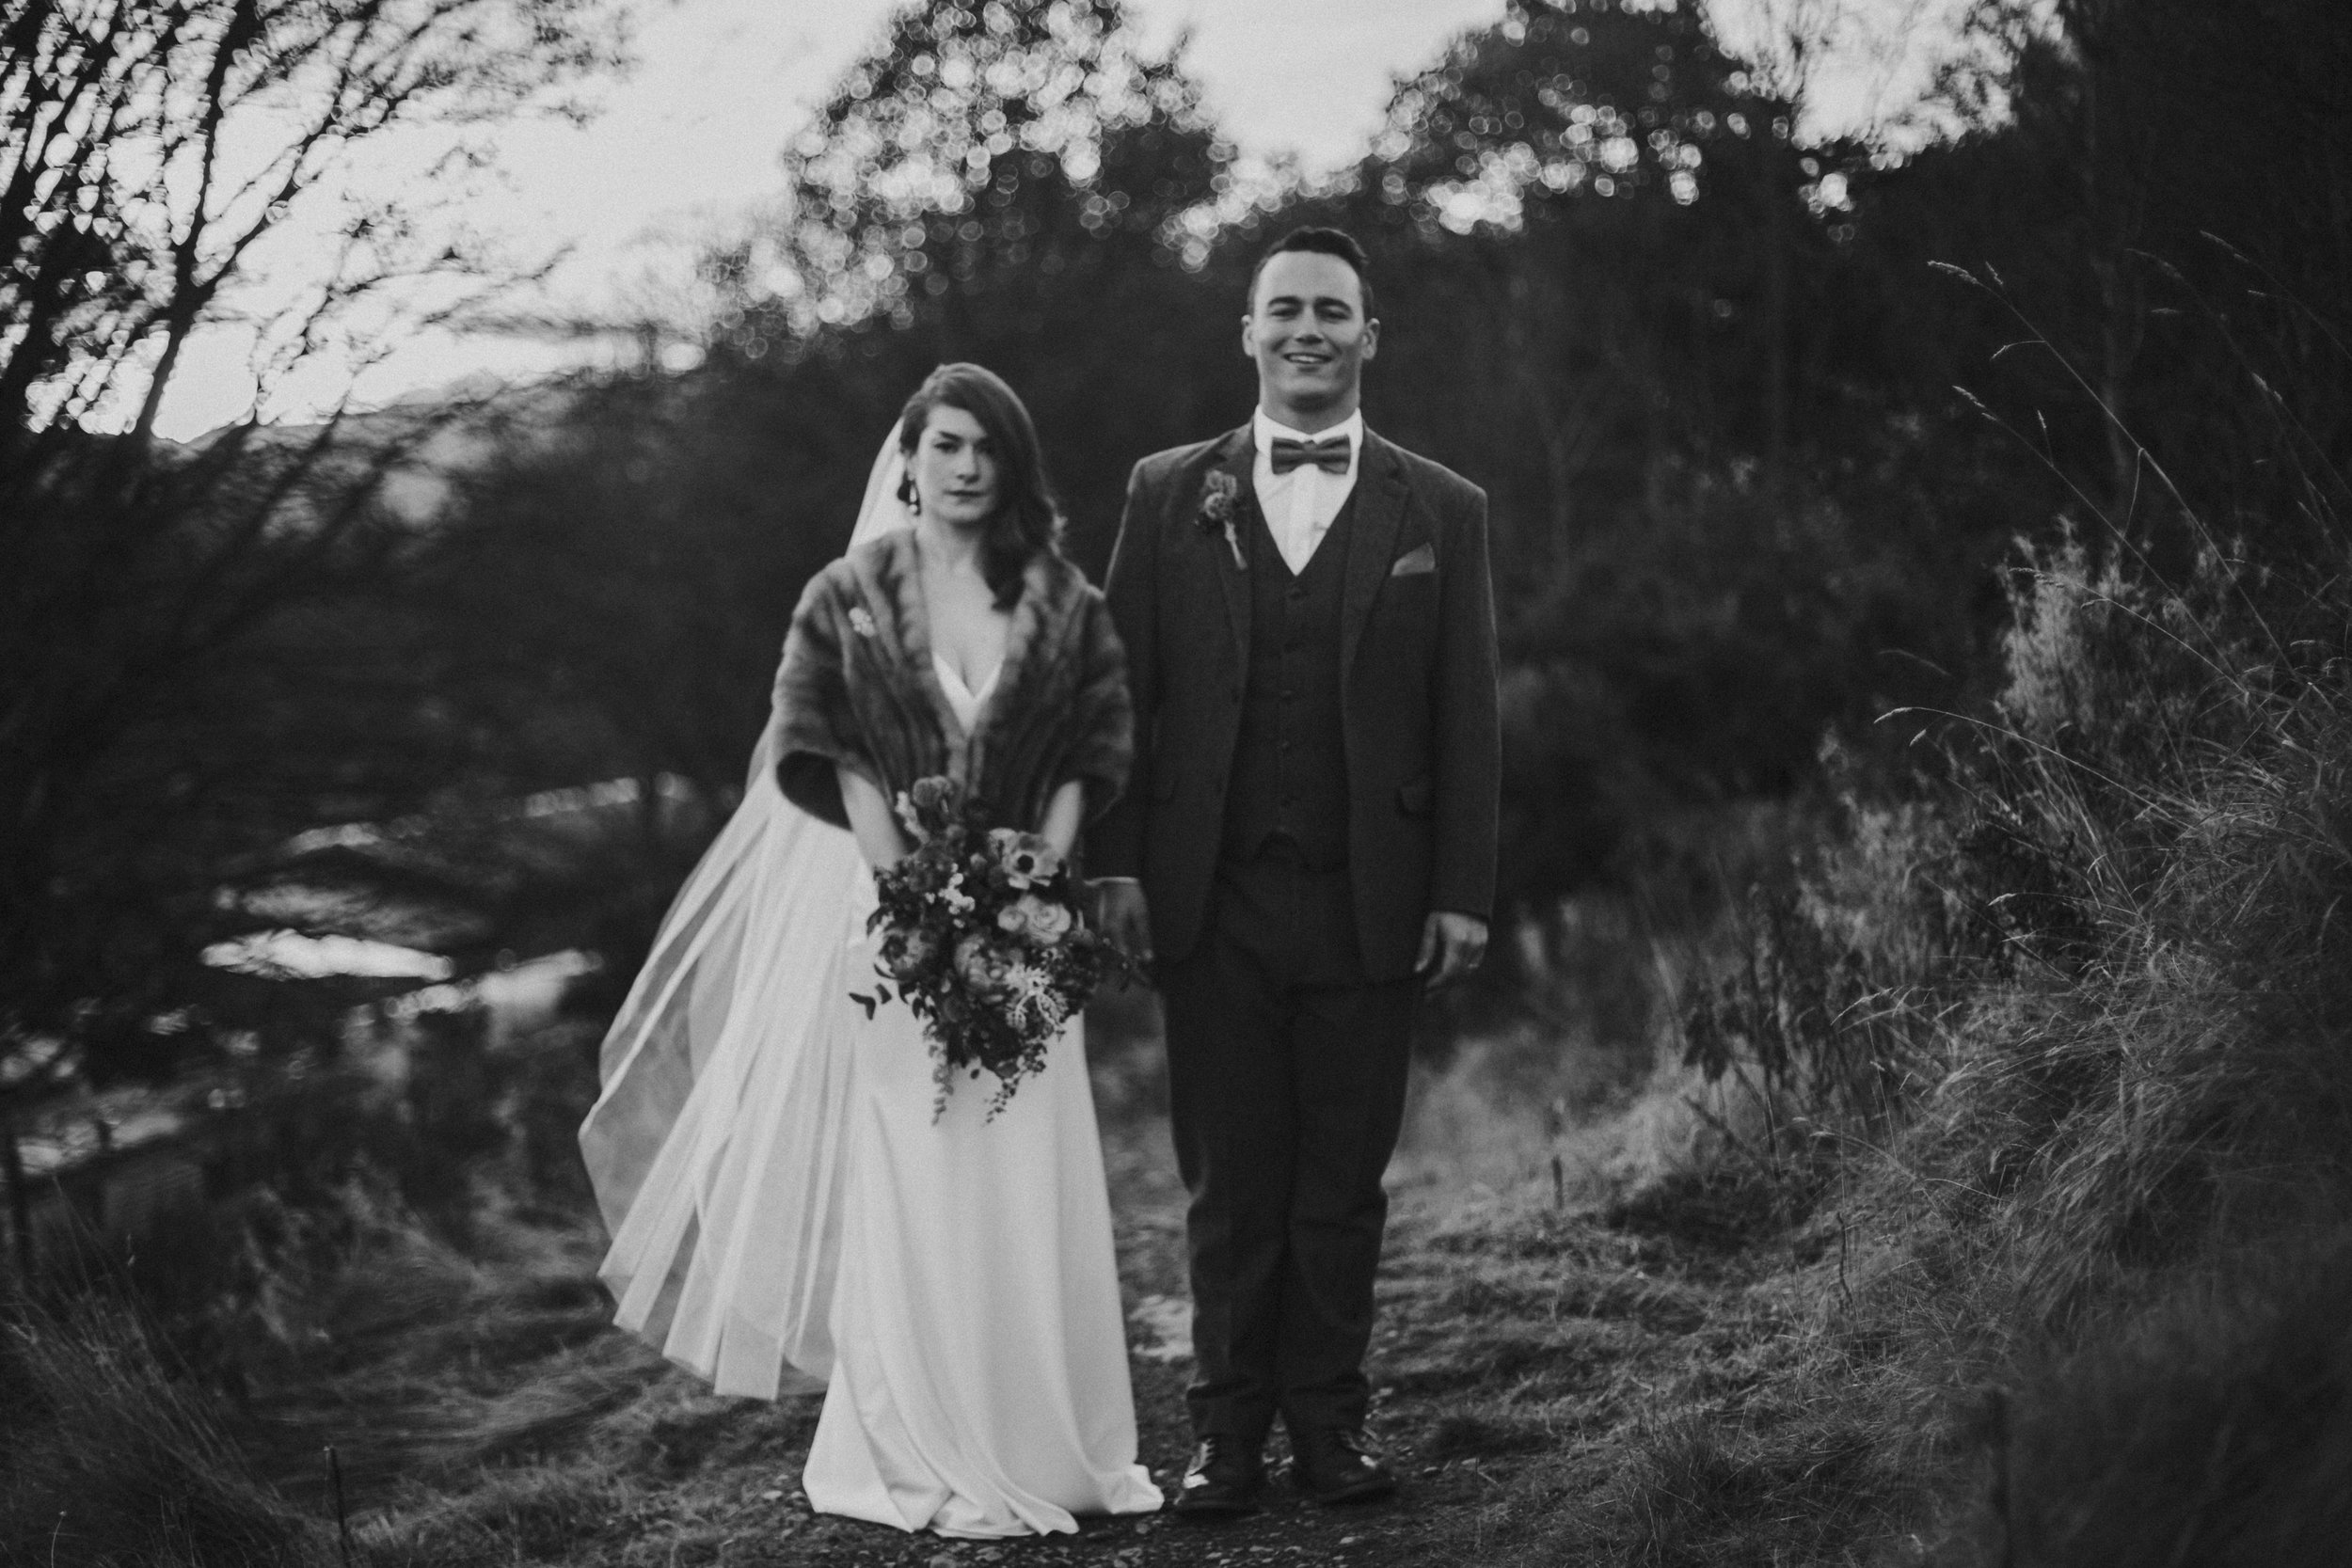 505_fine_art_wedding_photographer.jpg